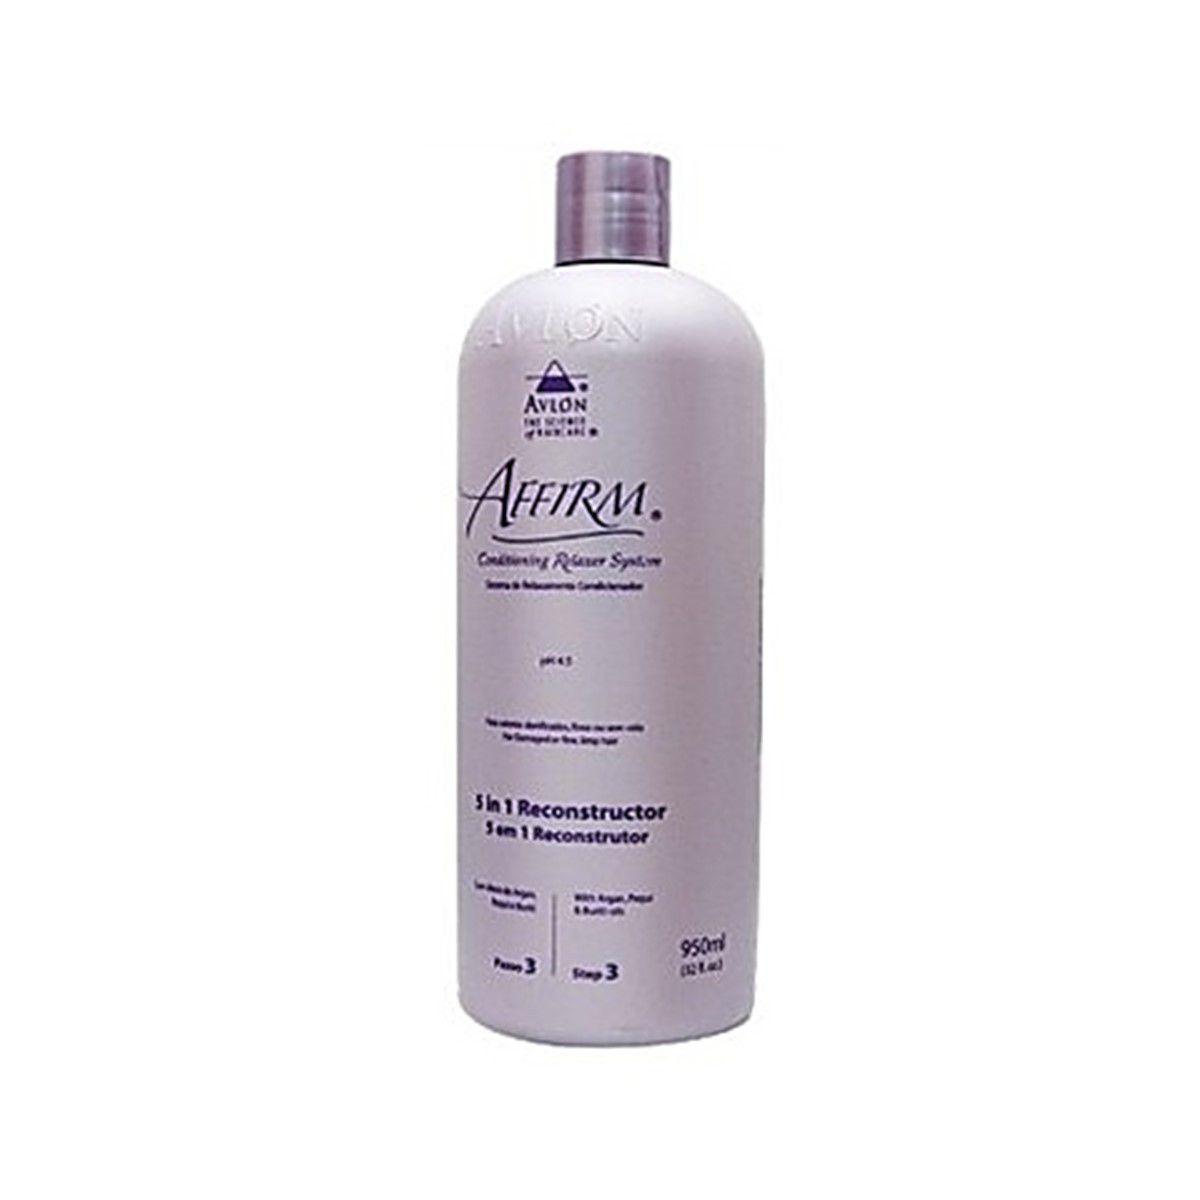 Avlon Affirm Moisture Plus Normalizing Shampoo 950ml - G